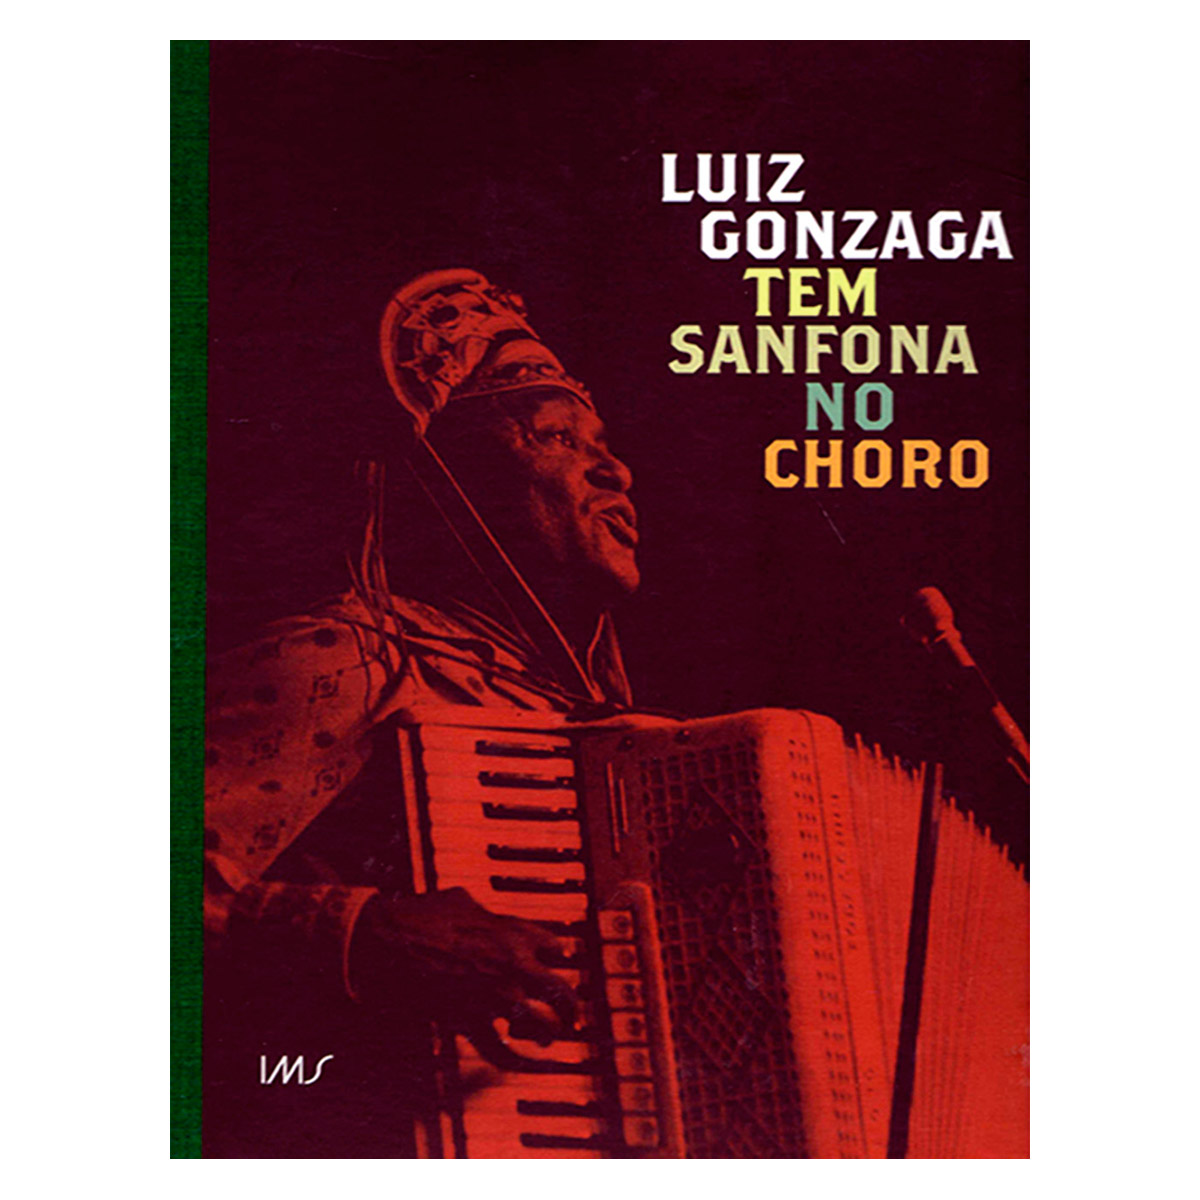 Livro Luiz Gonzaga Tem Sanfona no Choro - Inclui CD